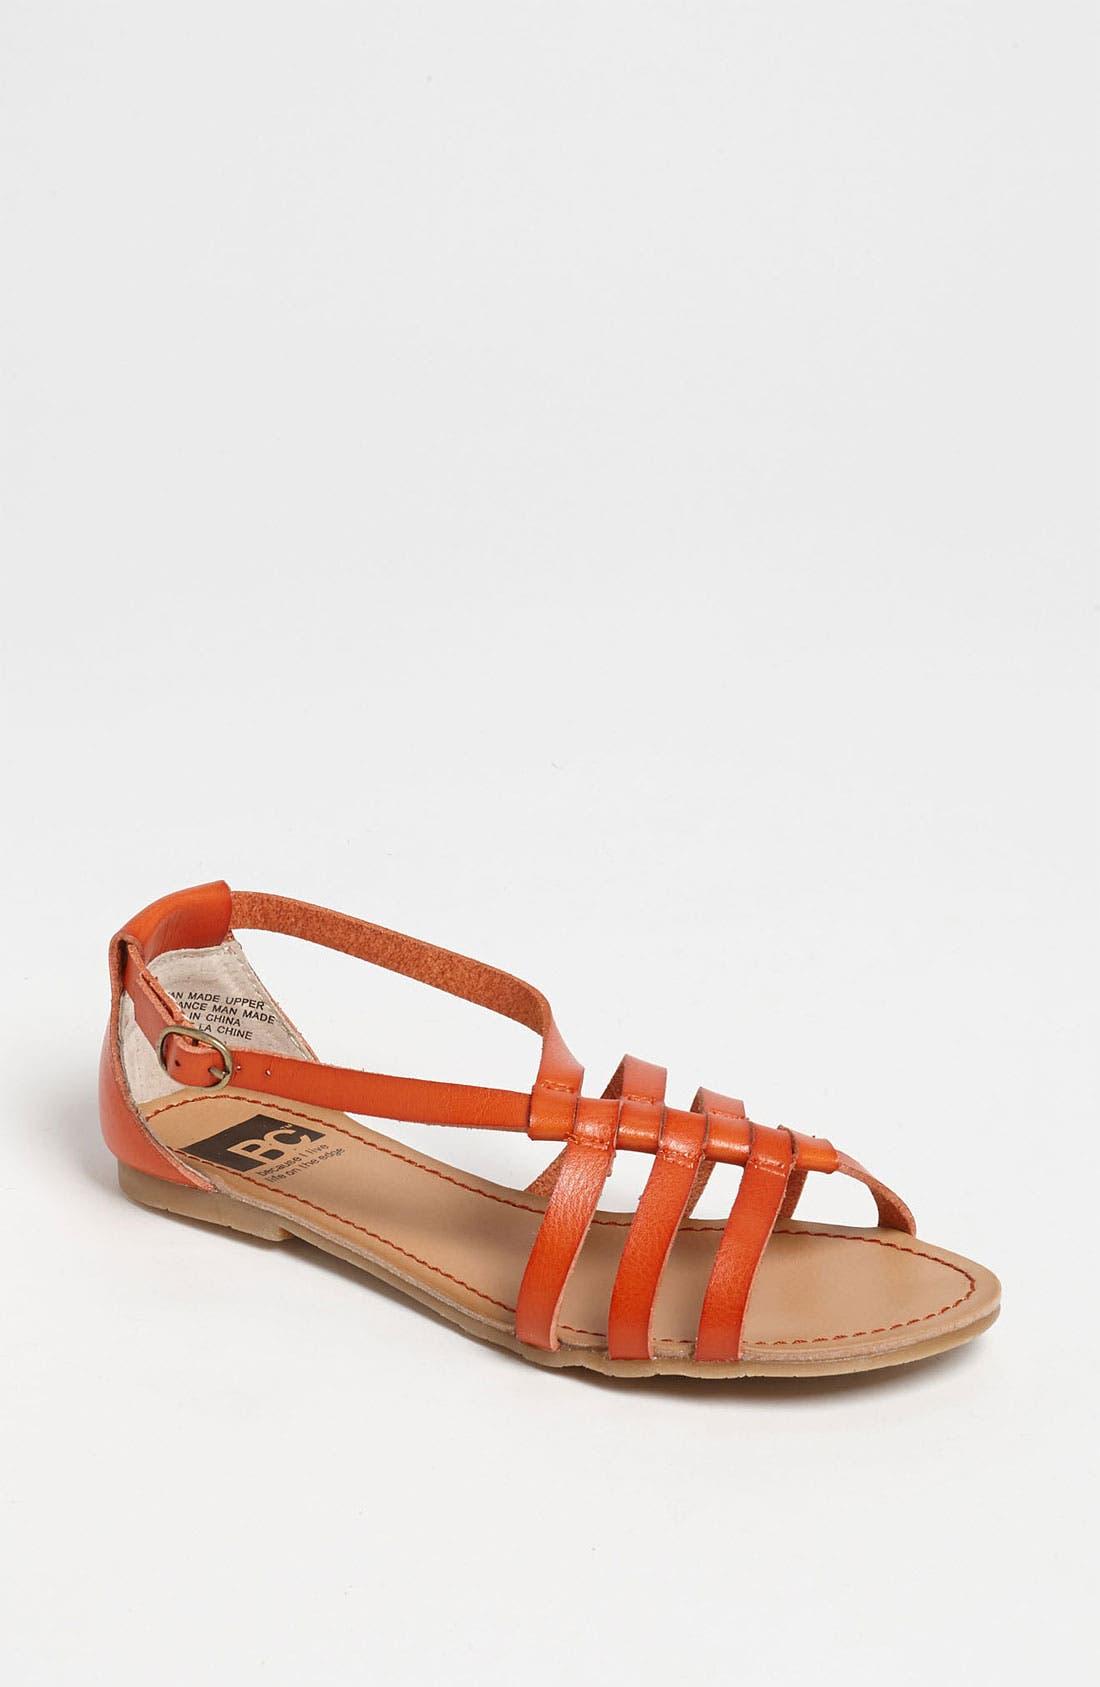 Alternate Image 1 Selected - BC Footwear 'At Large' Sandal